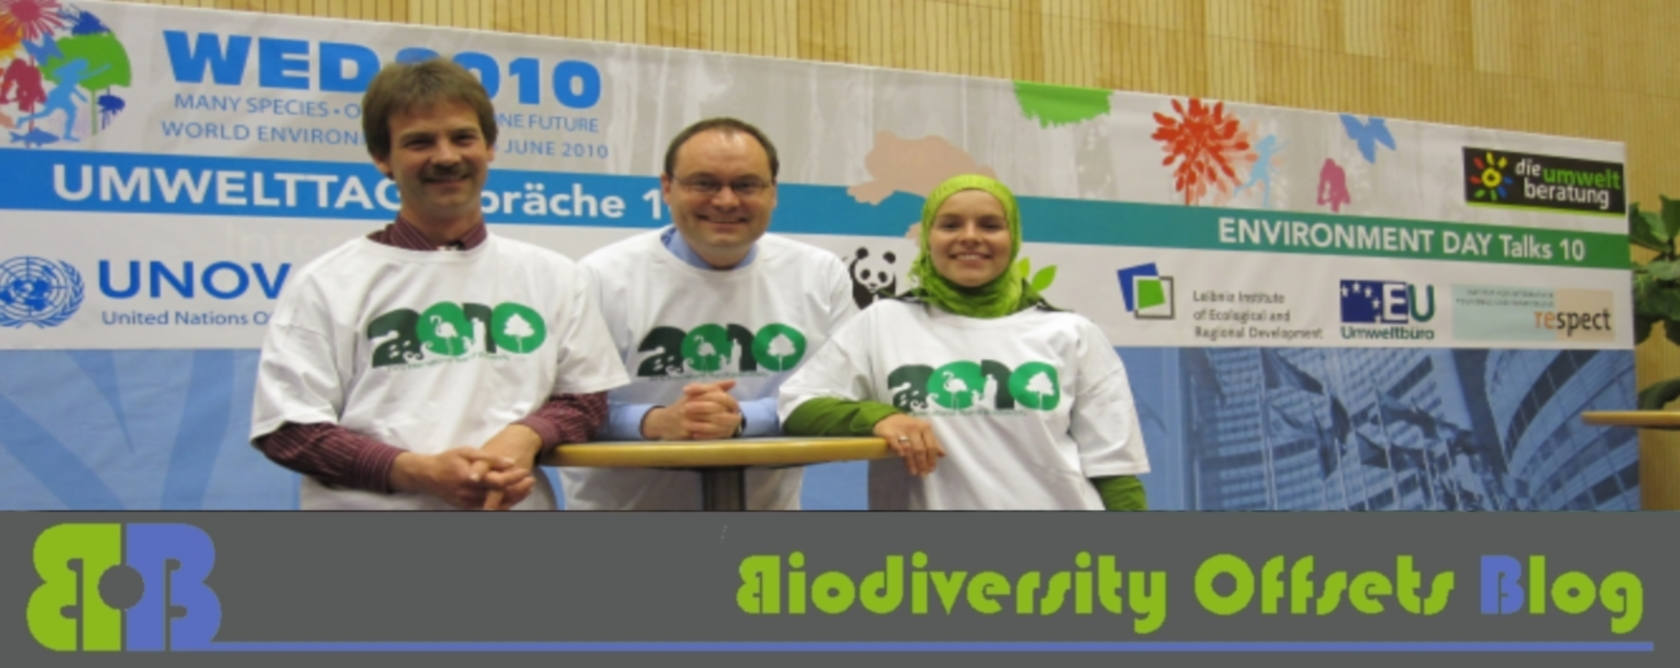 Biodiversity Offsets Blog Logo_hellgruen_Marianne_1680